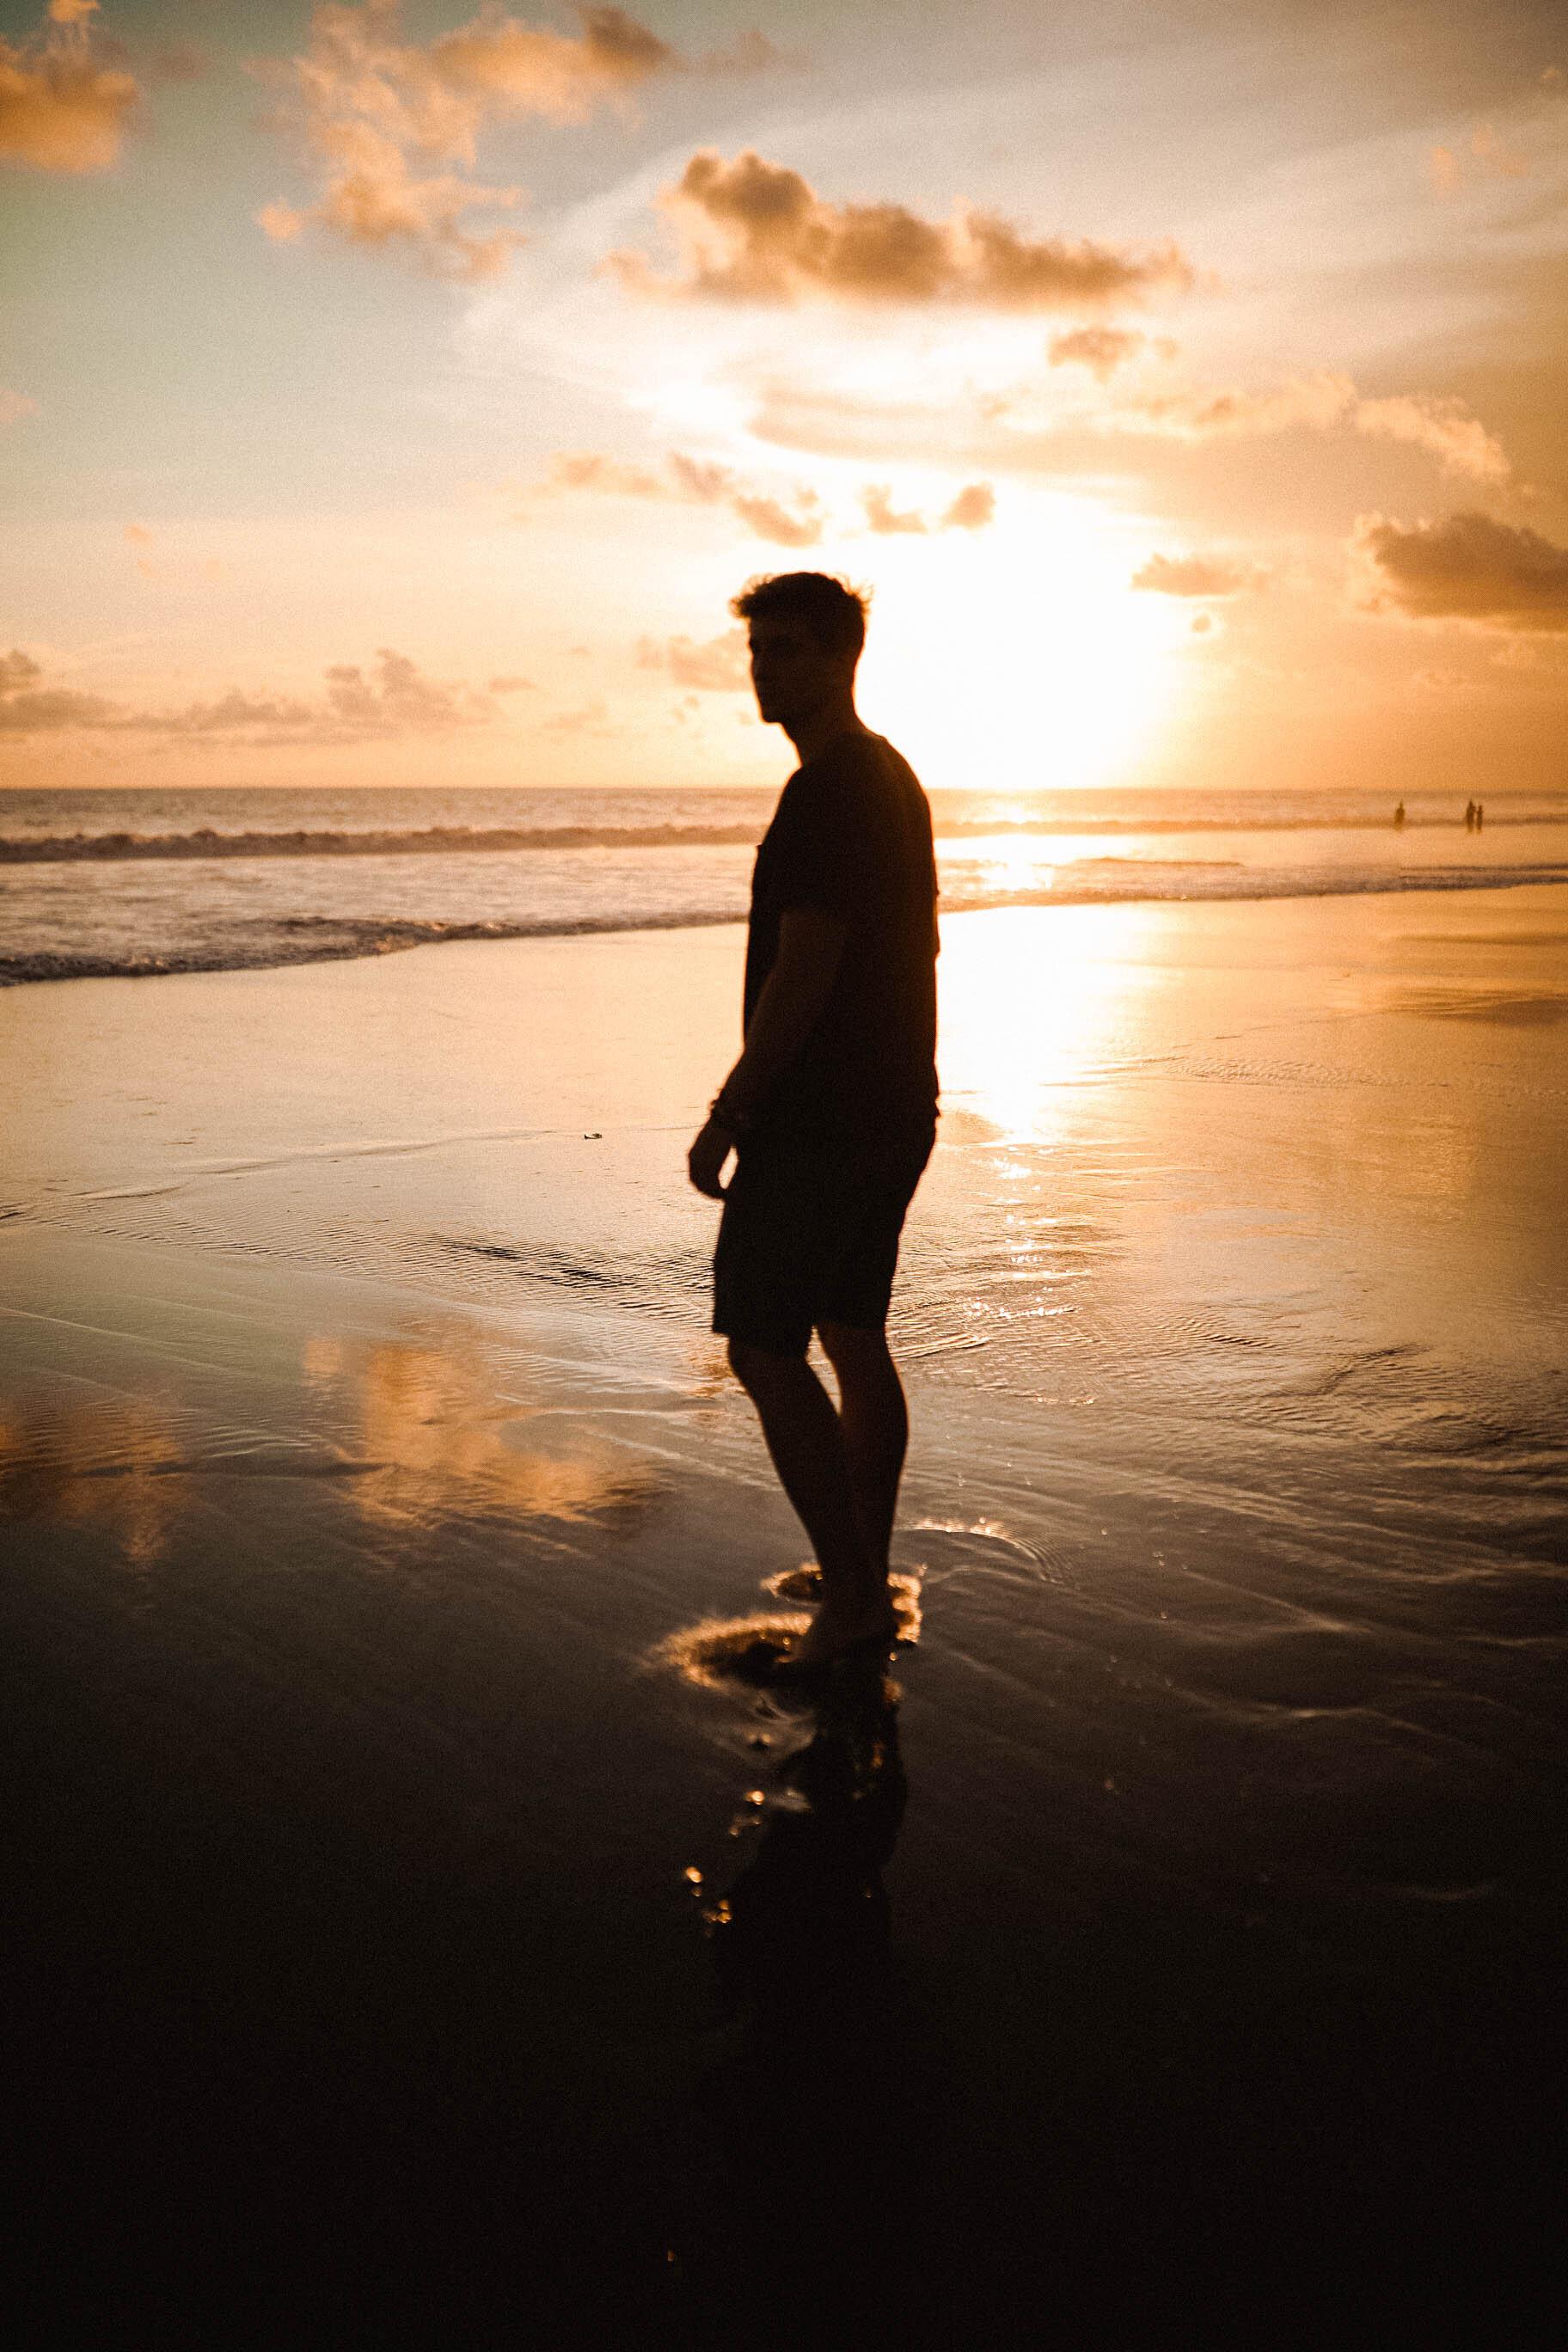 Lost LeBlanc on Berawa beach in Canggu at sunset, Bali